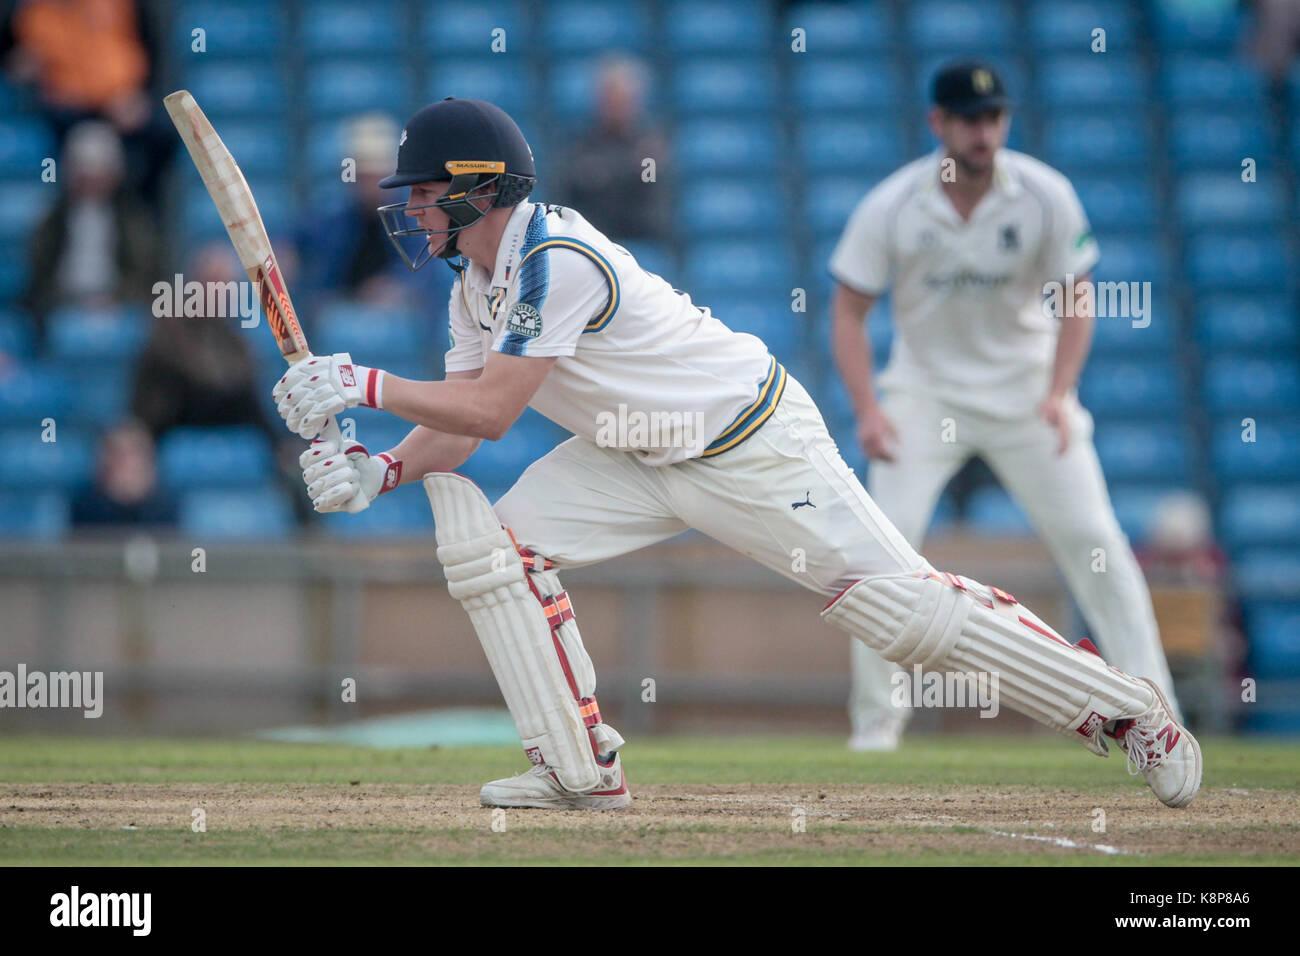 Leeds, UK. 20th Sep, 2017. Gary Ballance (Yorkshire CCC) plays a block shot Yorkshire CCC v Warwickshire CCC on - Stock Image